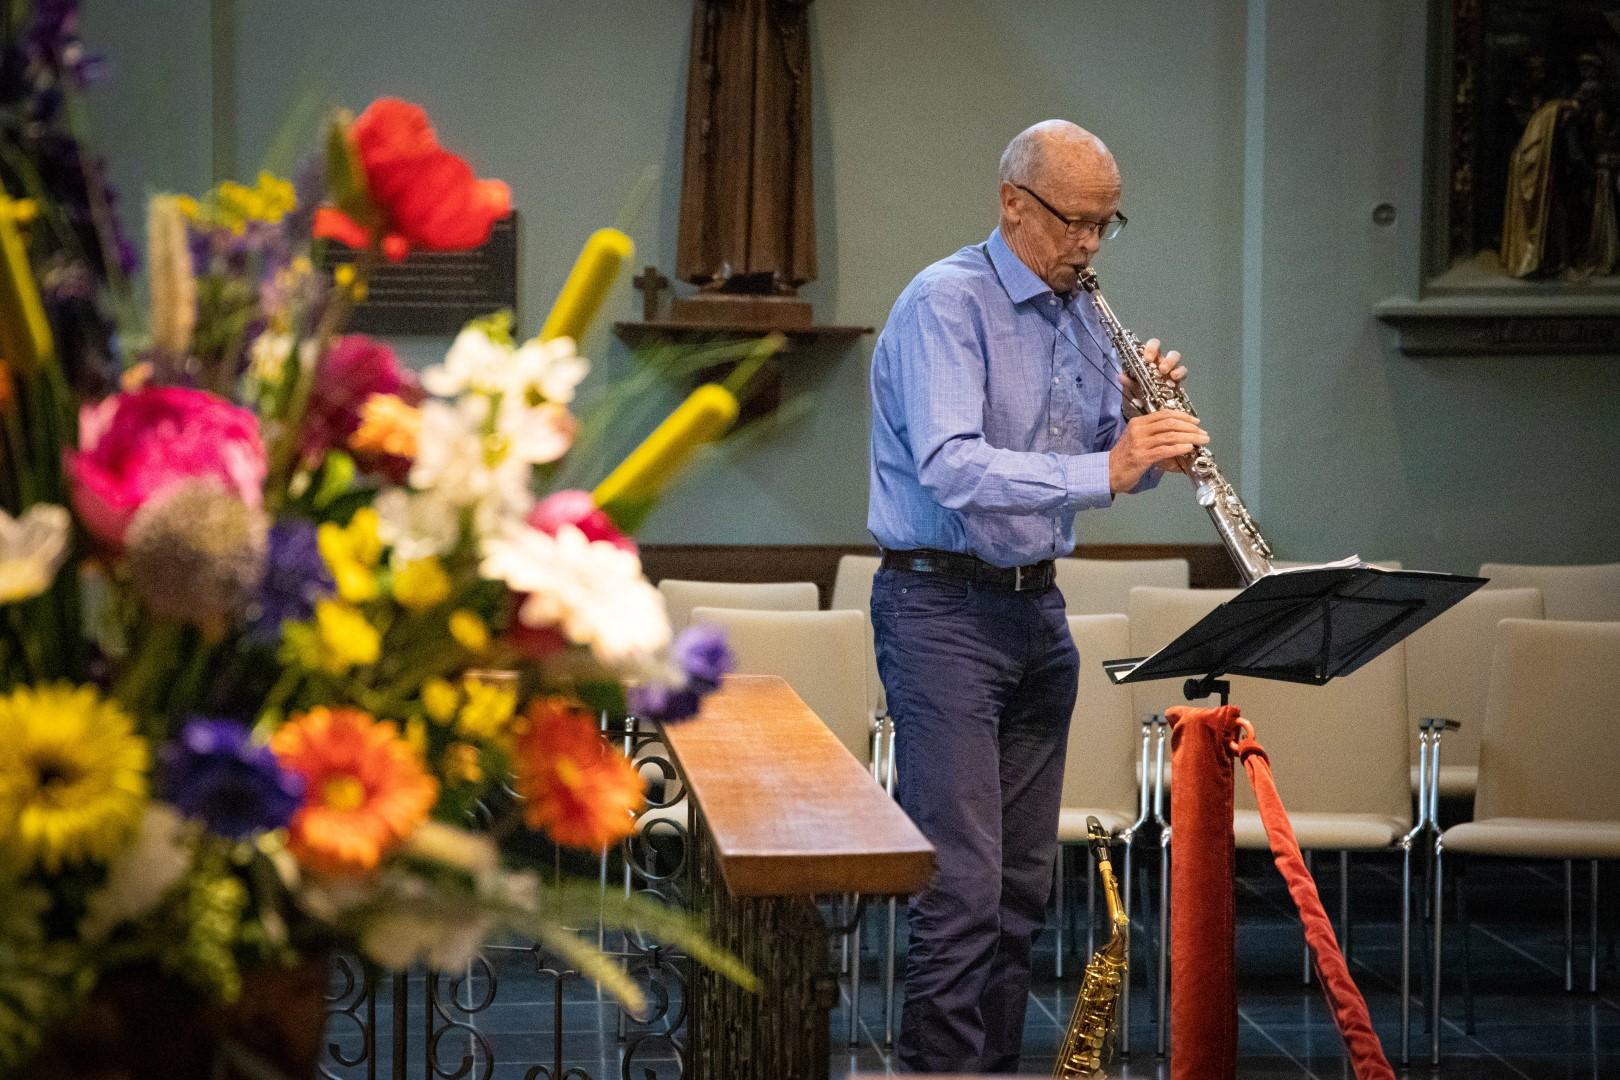 kapel het katrientje kerk open monumentendag geloof saxofoon